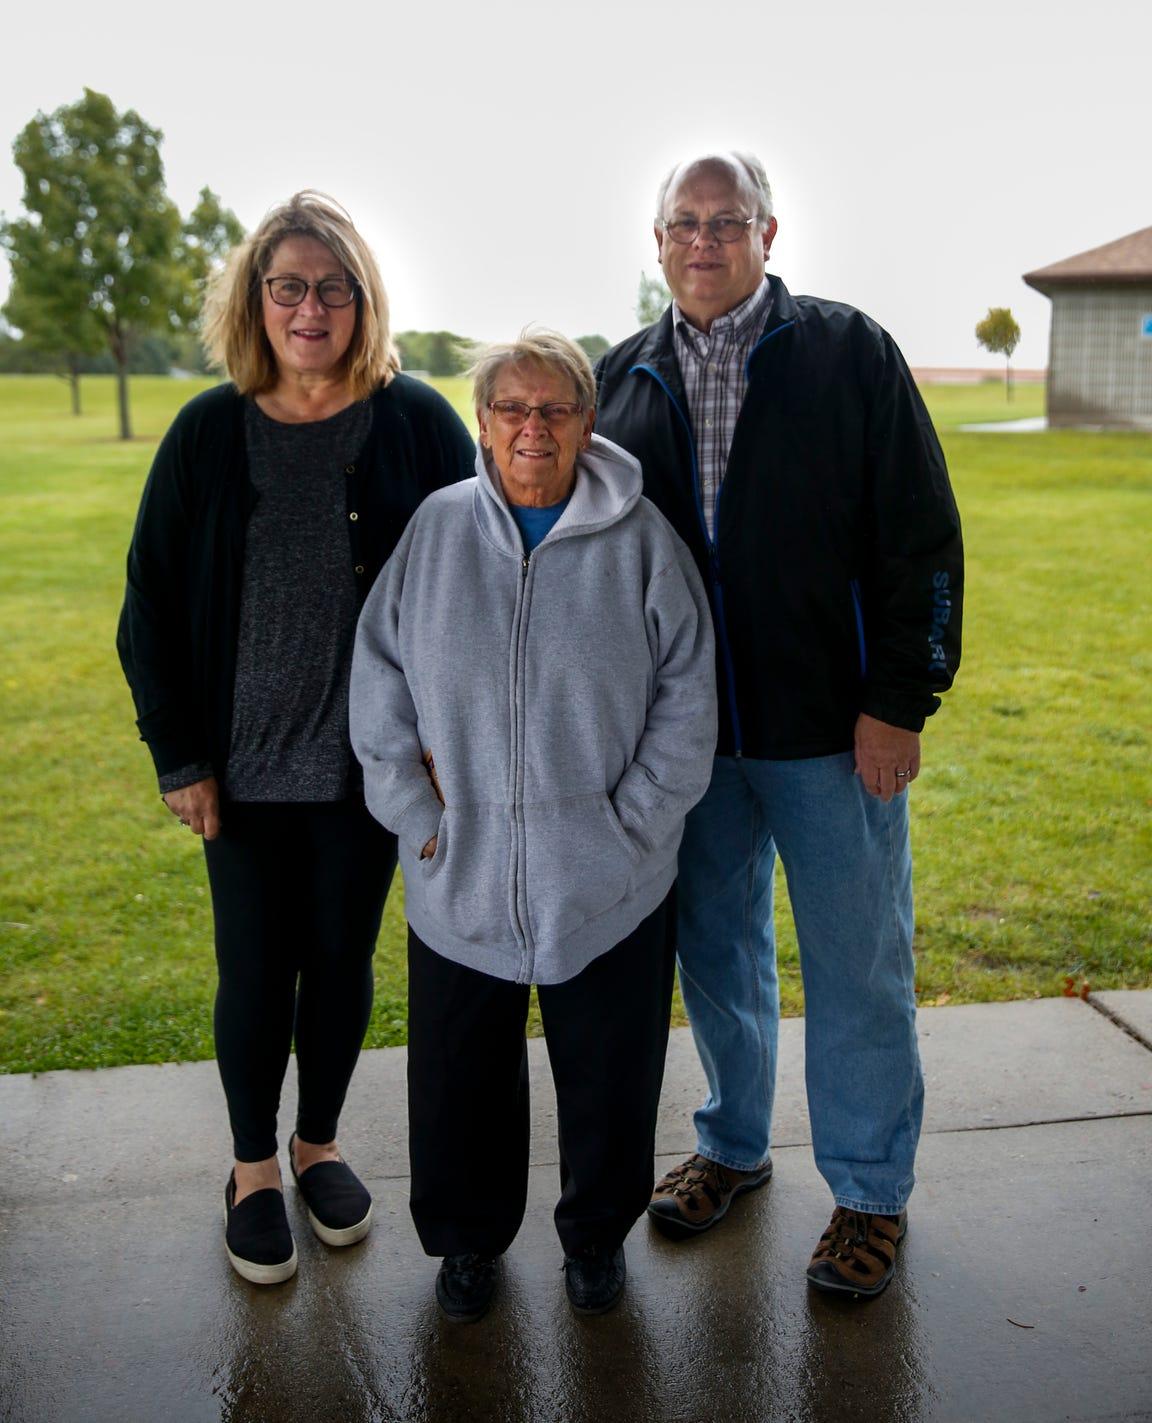 Julie Locke, Jo Pankonim and John Nordlie (seen here at Kenny Anderson Park) are board members of the Oak View Neighborhood Association.